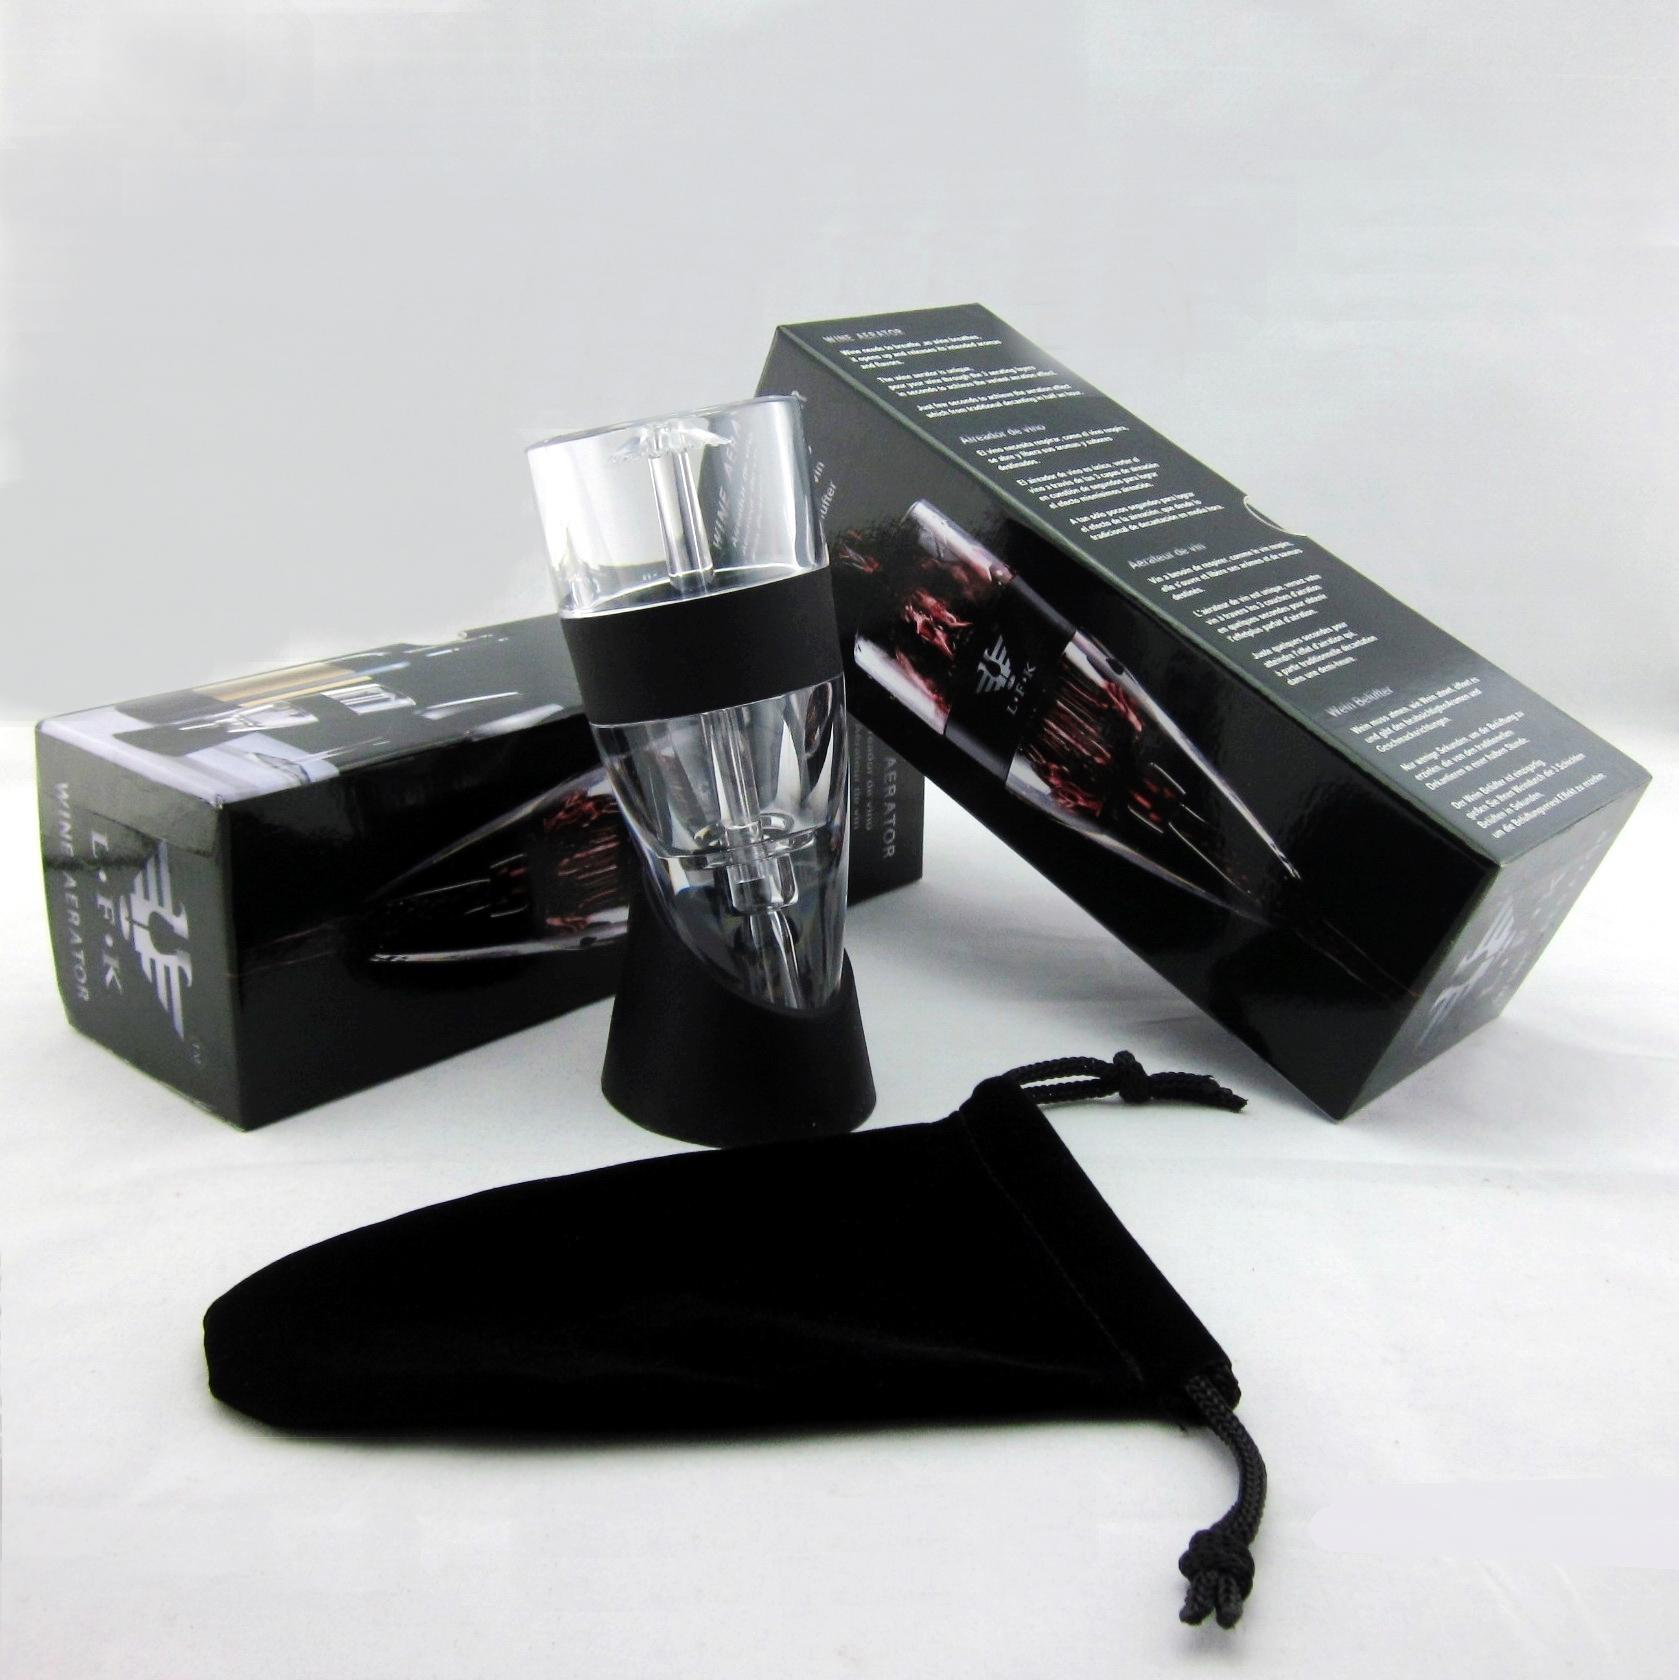 Global patented 3-step wine aerator 4